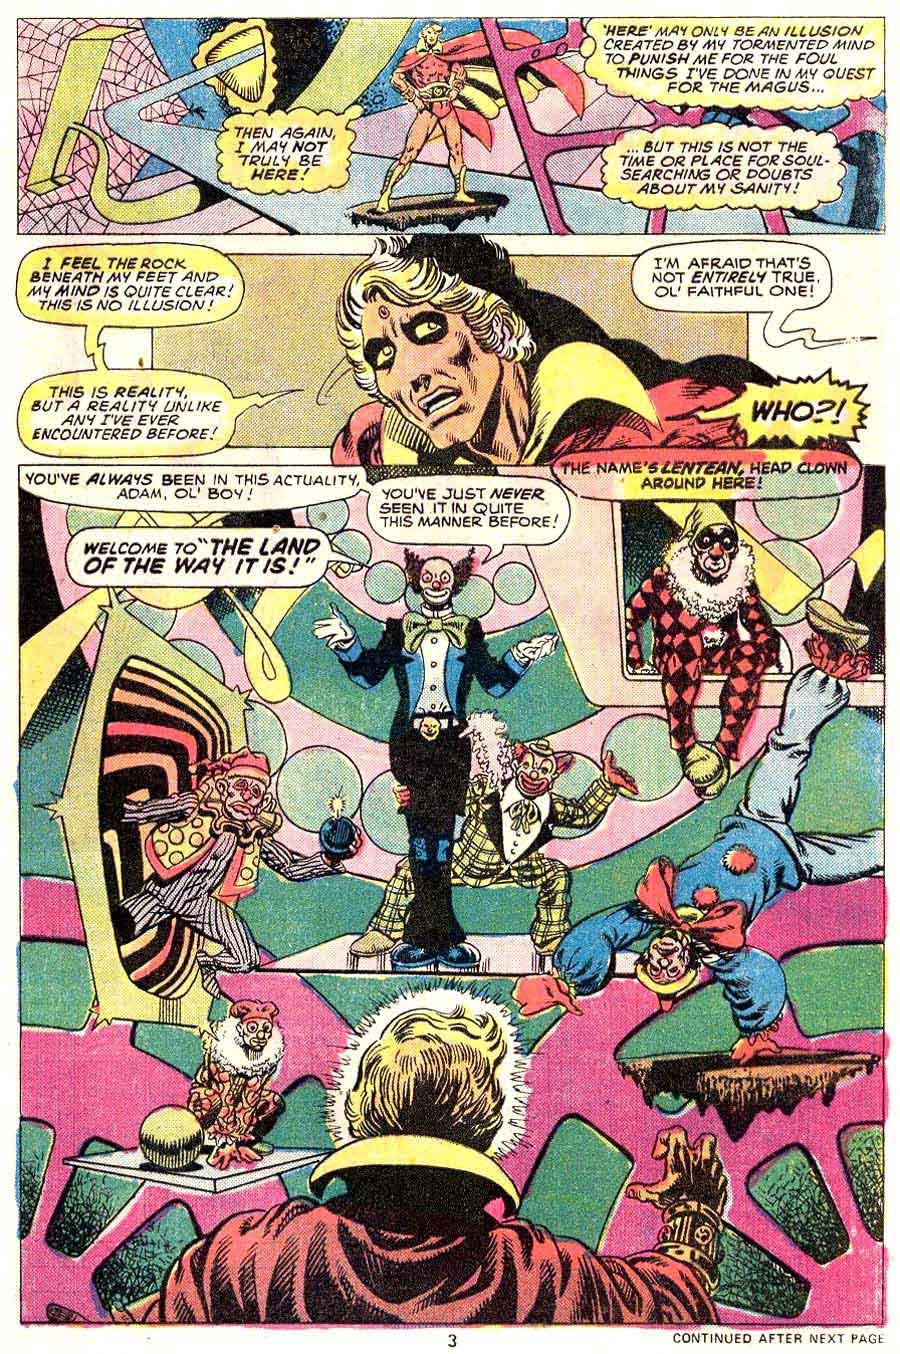 Strange Tales v1 #181 marvel warlock comic book page art by Jim Starlin